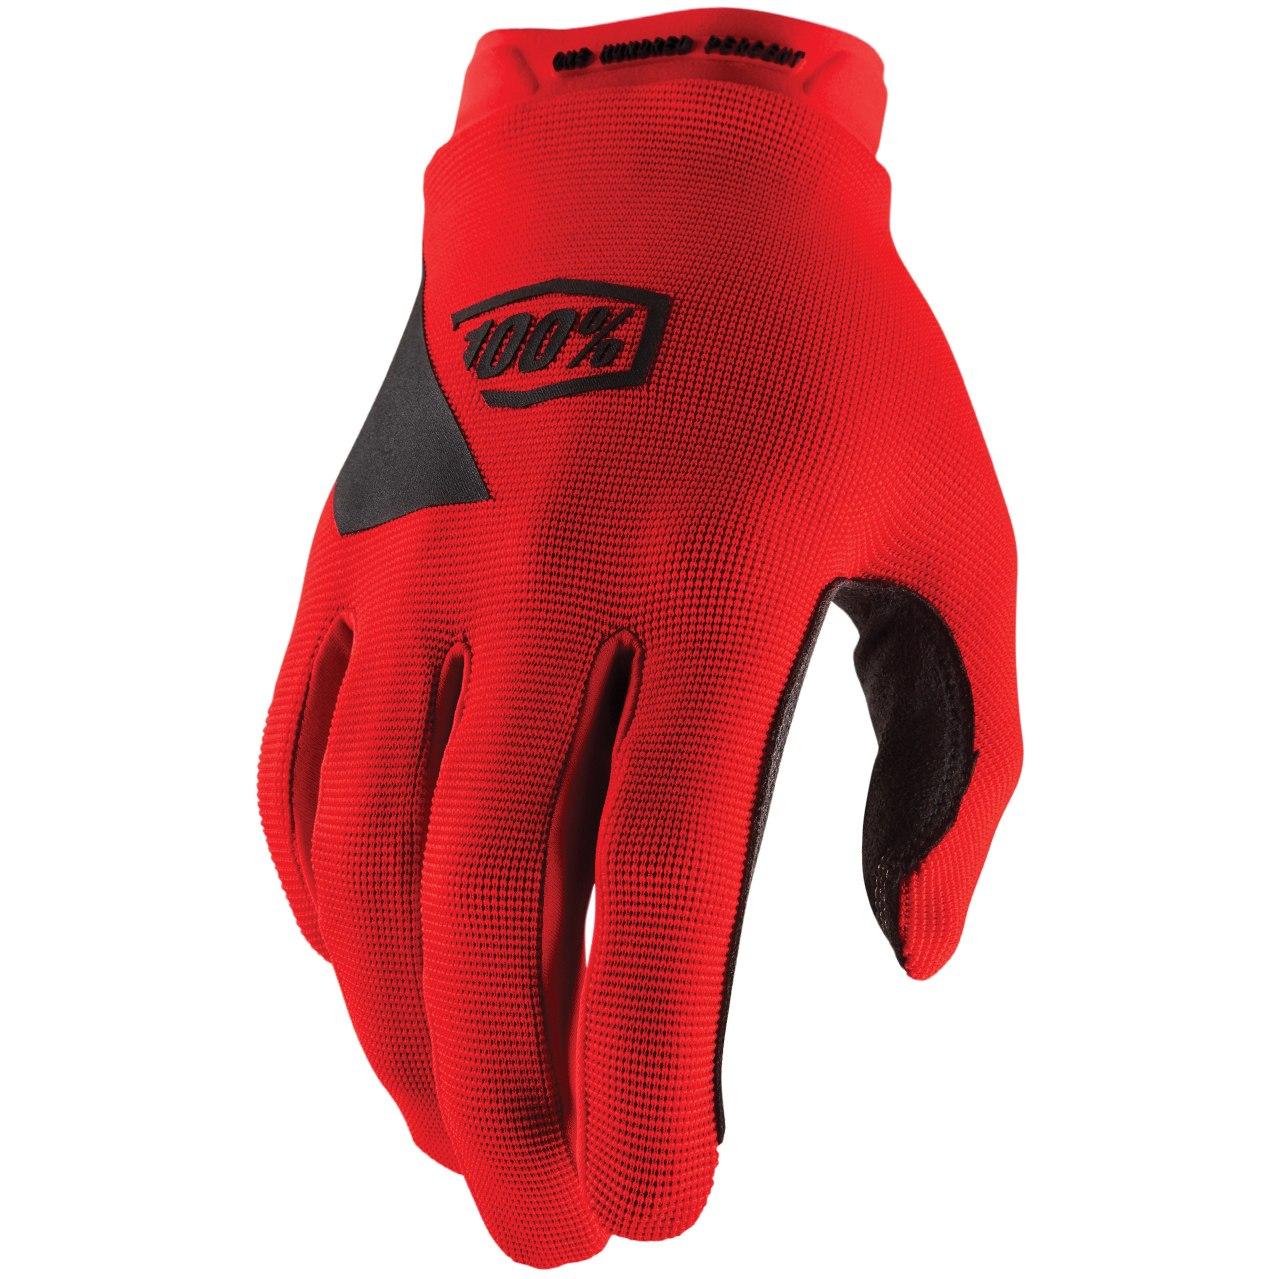 100% Ridecamp Glove - Red